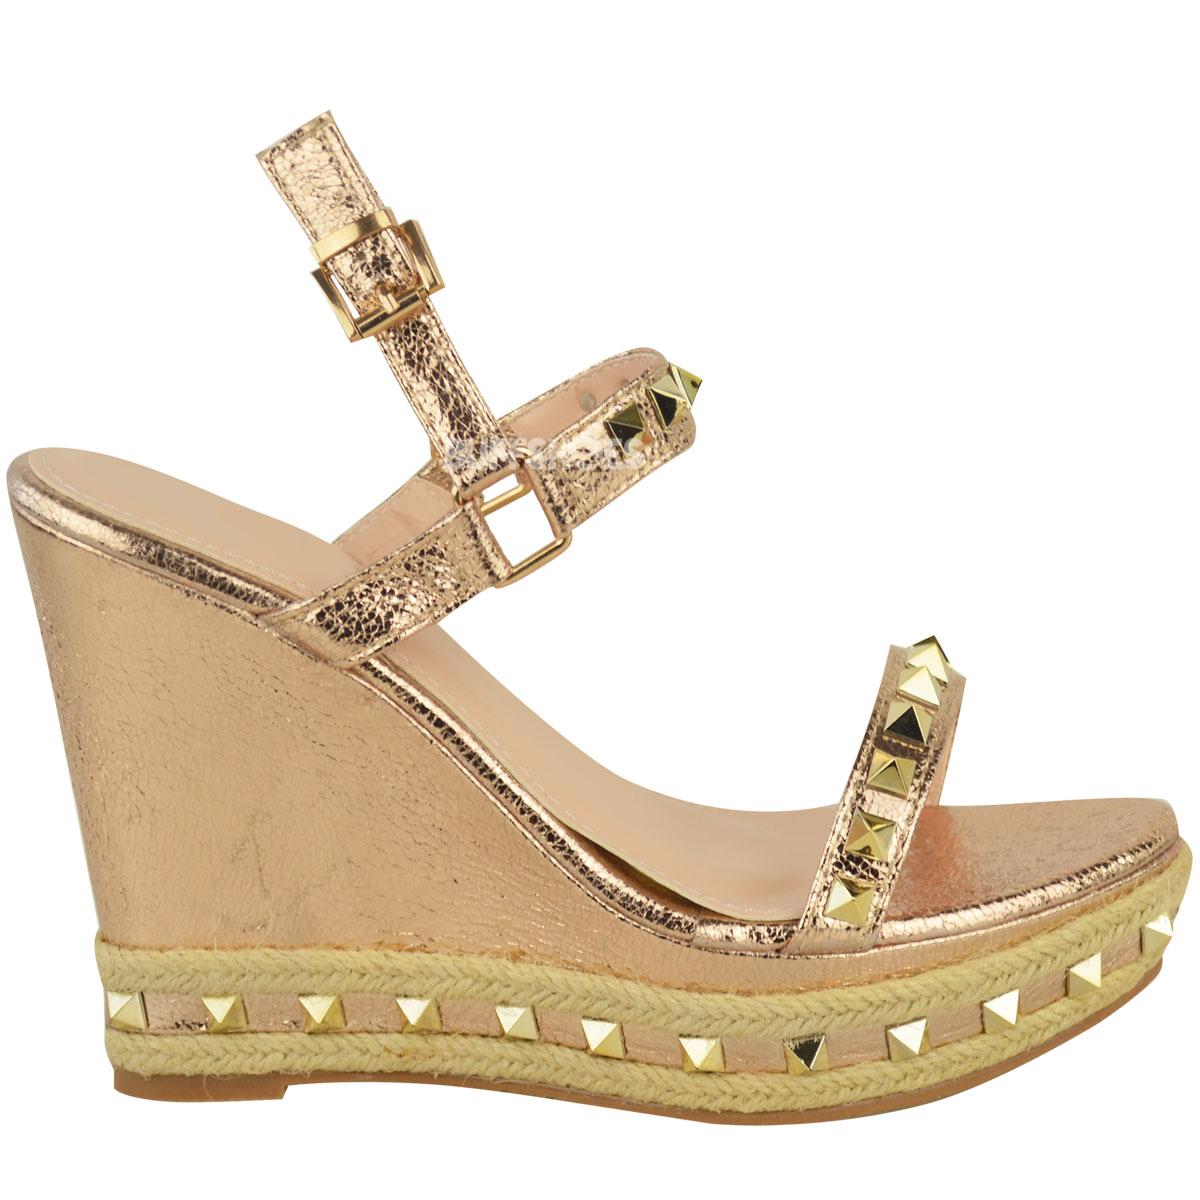 e7e4e3e64a5ab5 Womens Ladies Studded Espadrille Wedge High Heel Sandals Ankle Strap ...